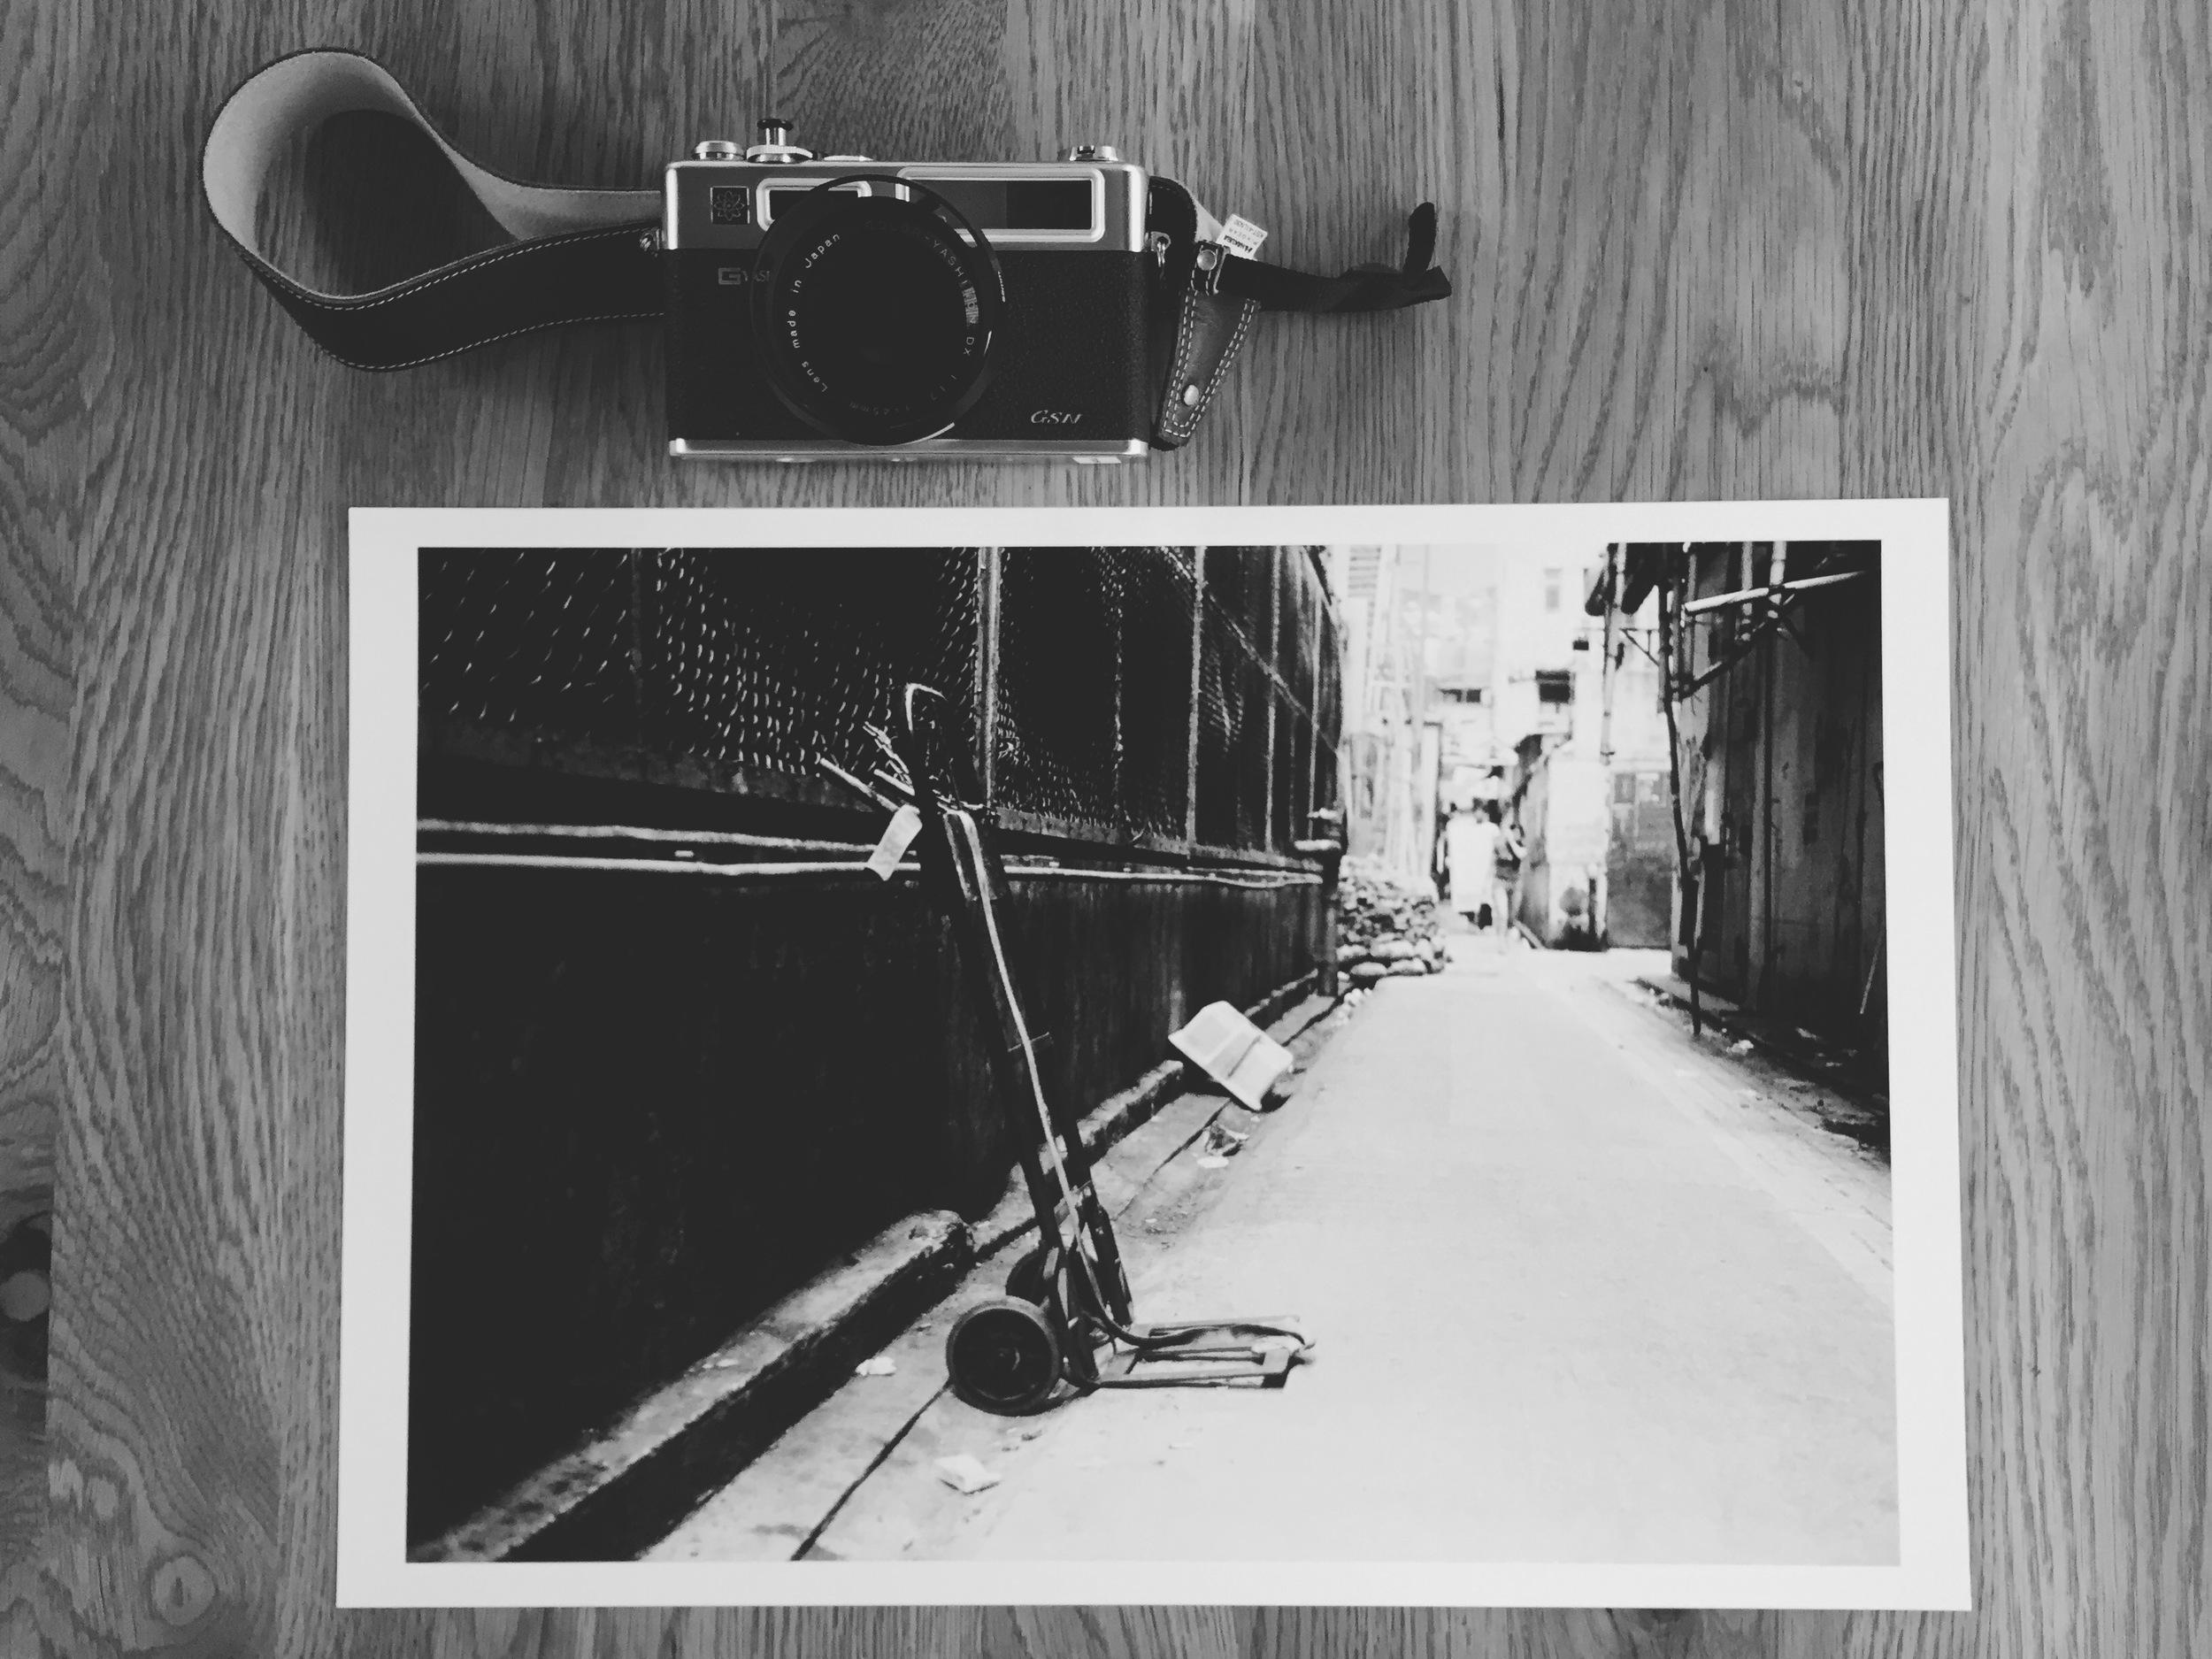 Foto 07.12.15, 14 43 00 (1).jpg